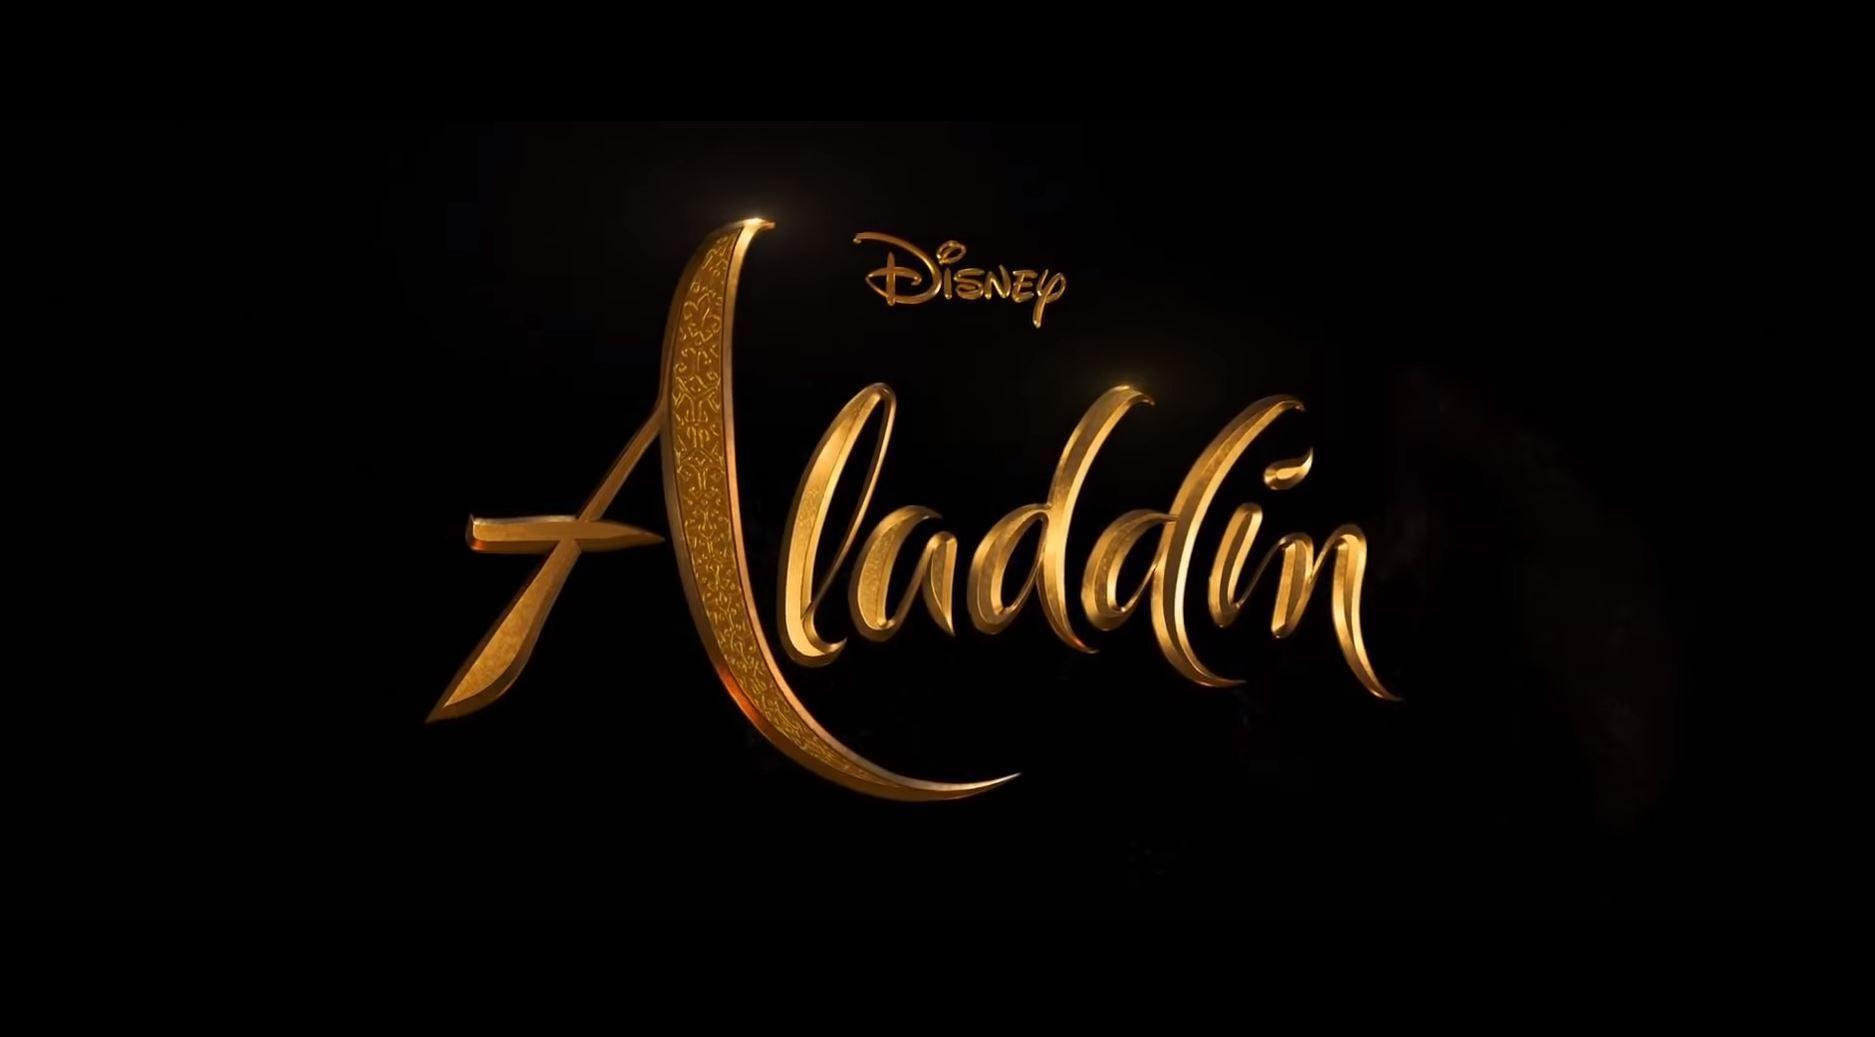 Live action Aladdin logo